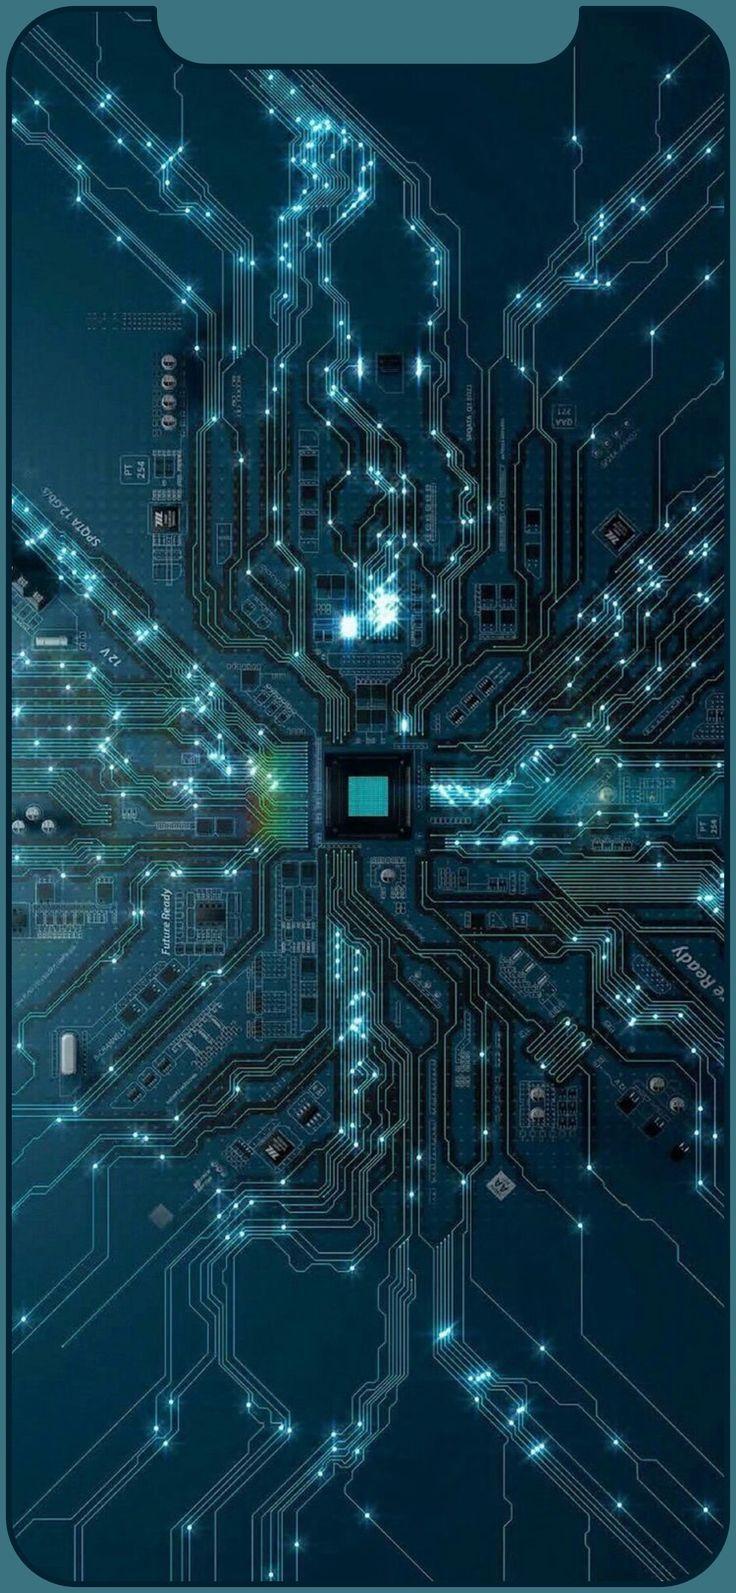 Pin on 科技背景图